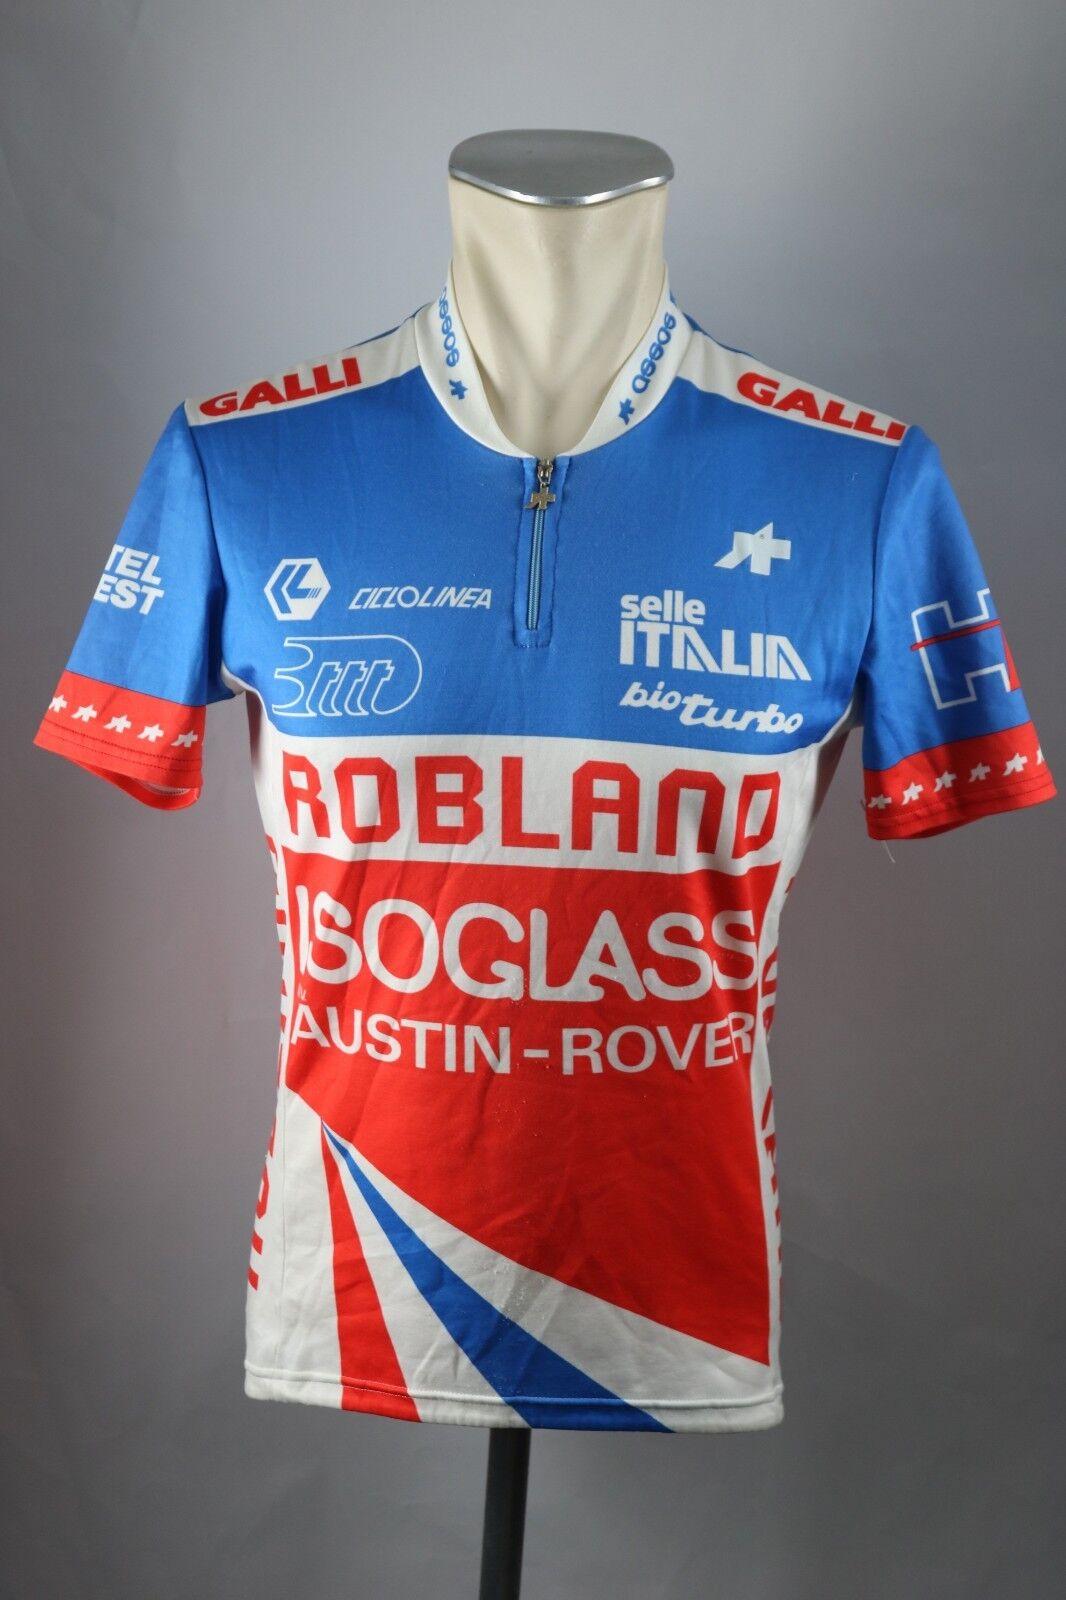 Assos Robland Isoglass Team 1987 Rad Trikot Gr. M  Bike cycling jersey Shirt S5